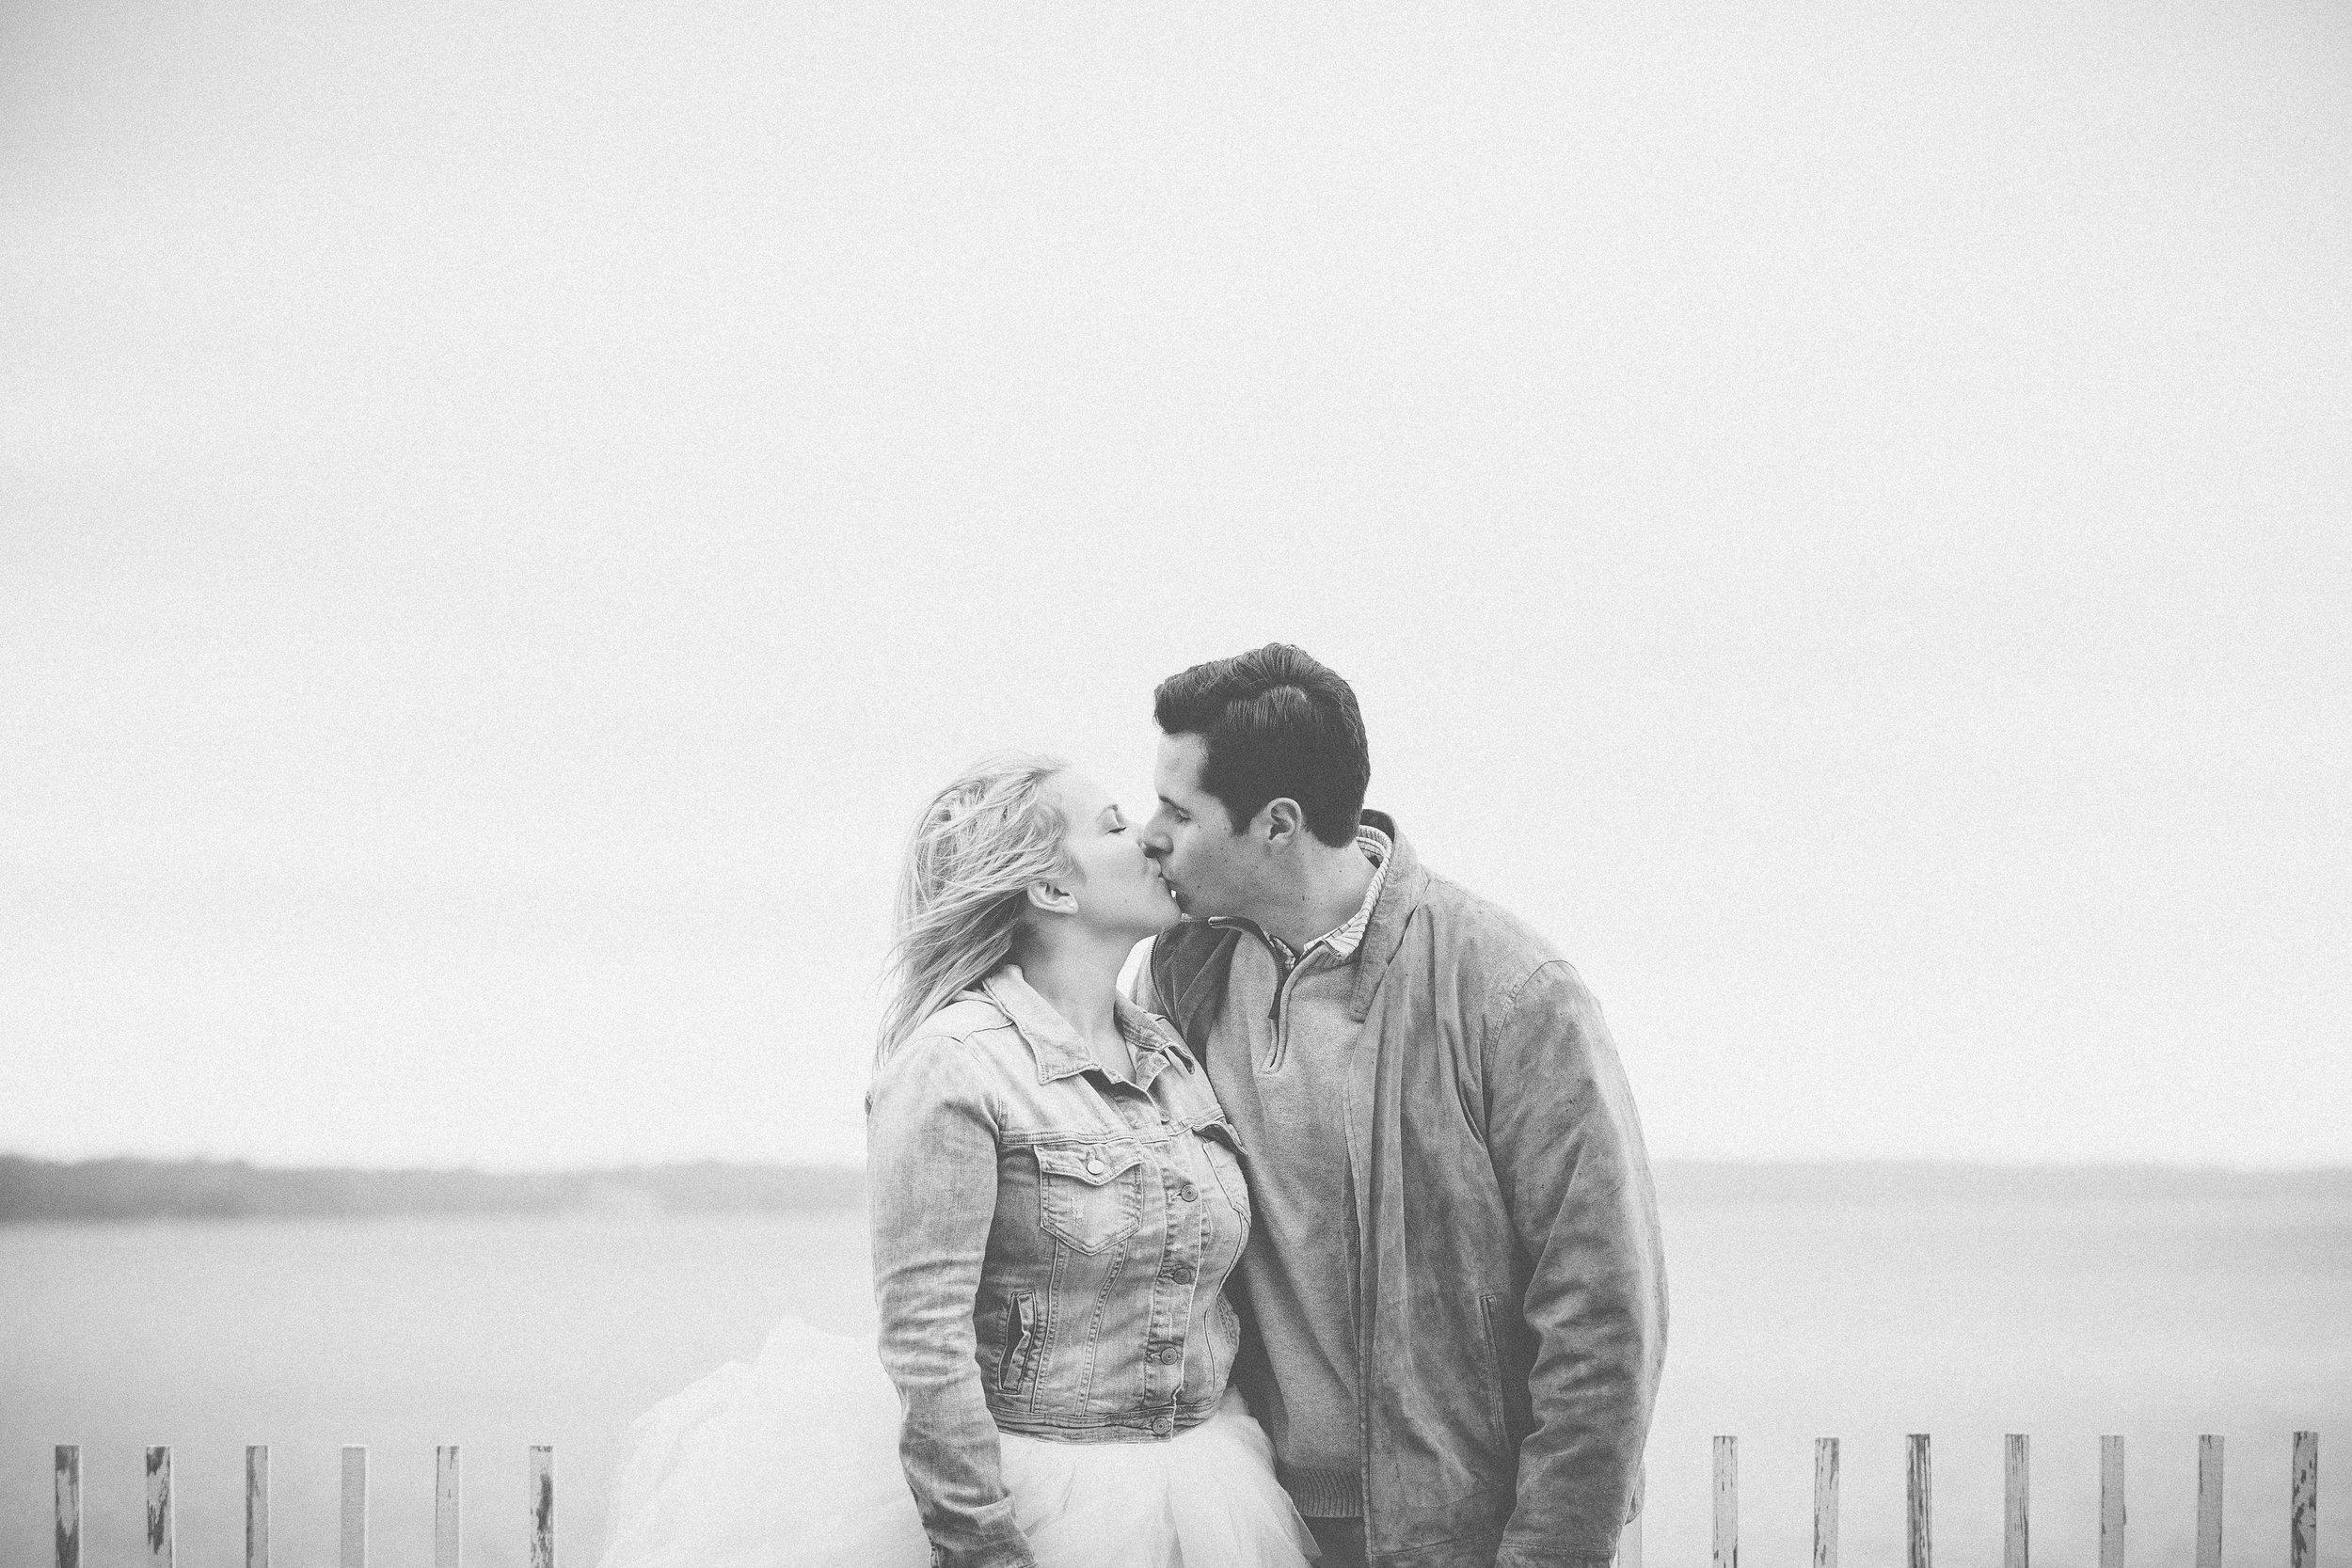 MP_16.12.18_Nick & Kendall Engagement Shoot-0217.jpg